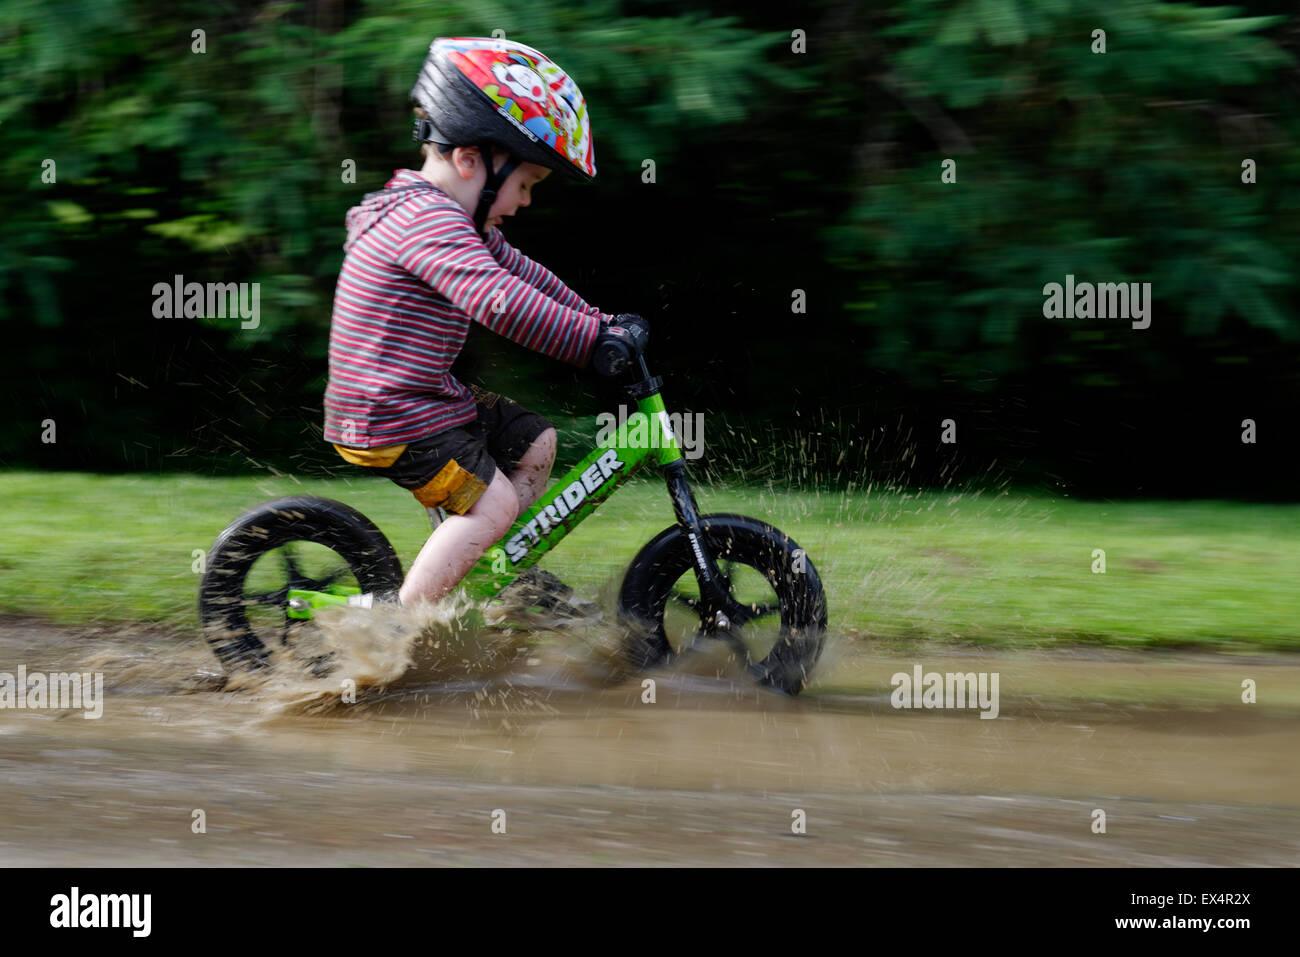 a-young-boy-3-yrs-riding-a-balance-bike-